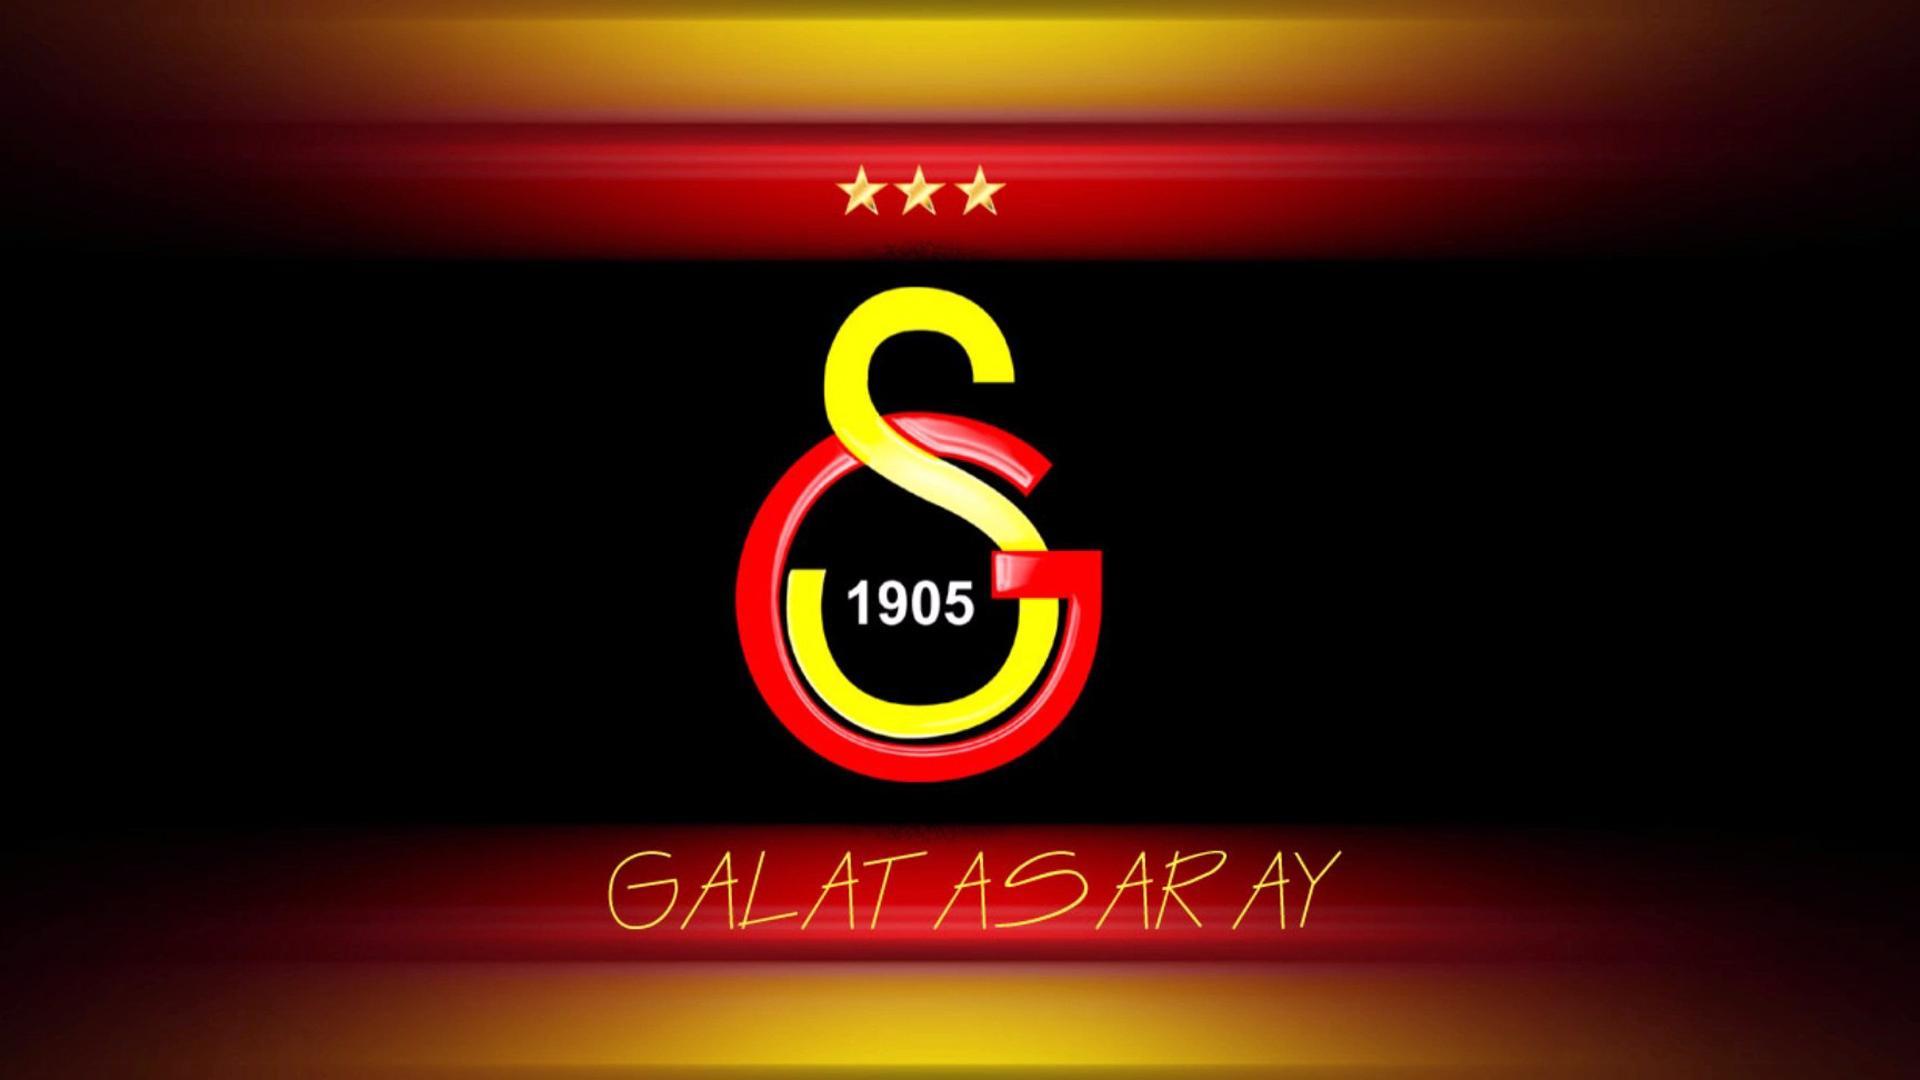 Galatasaray FC Football Logo HD Wallpaper of Football 1920x1080